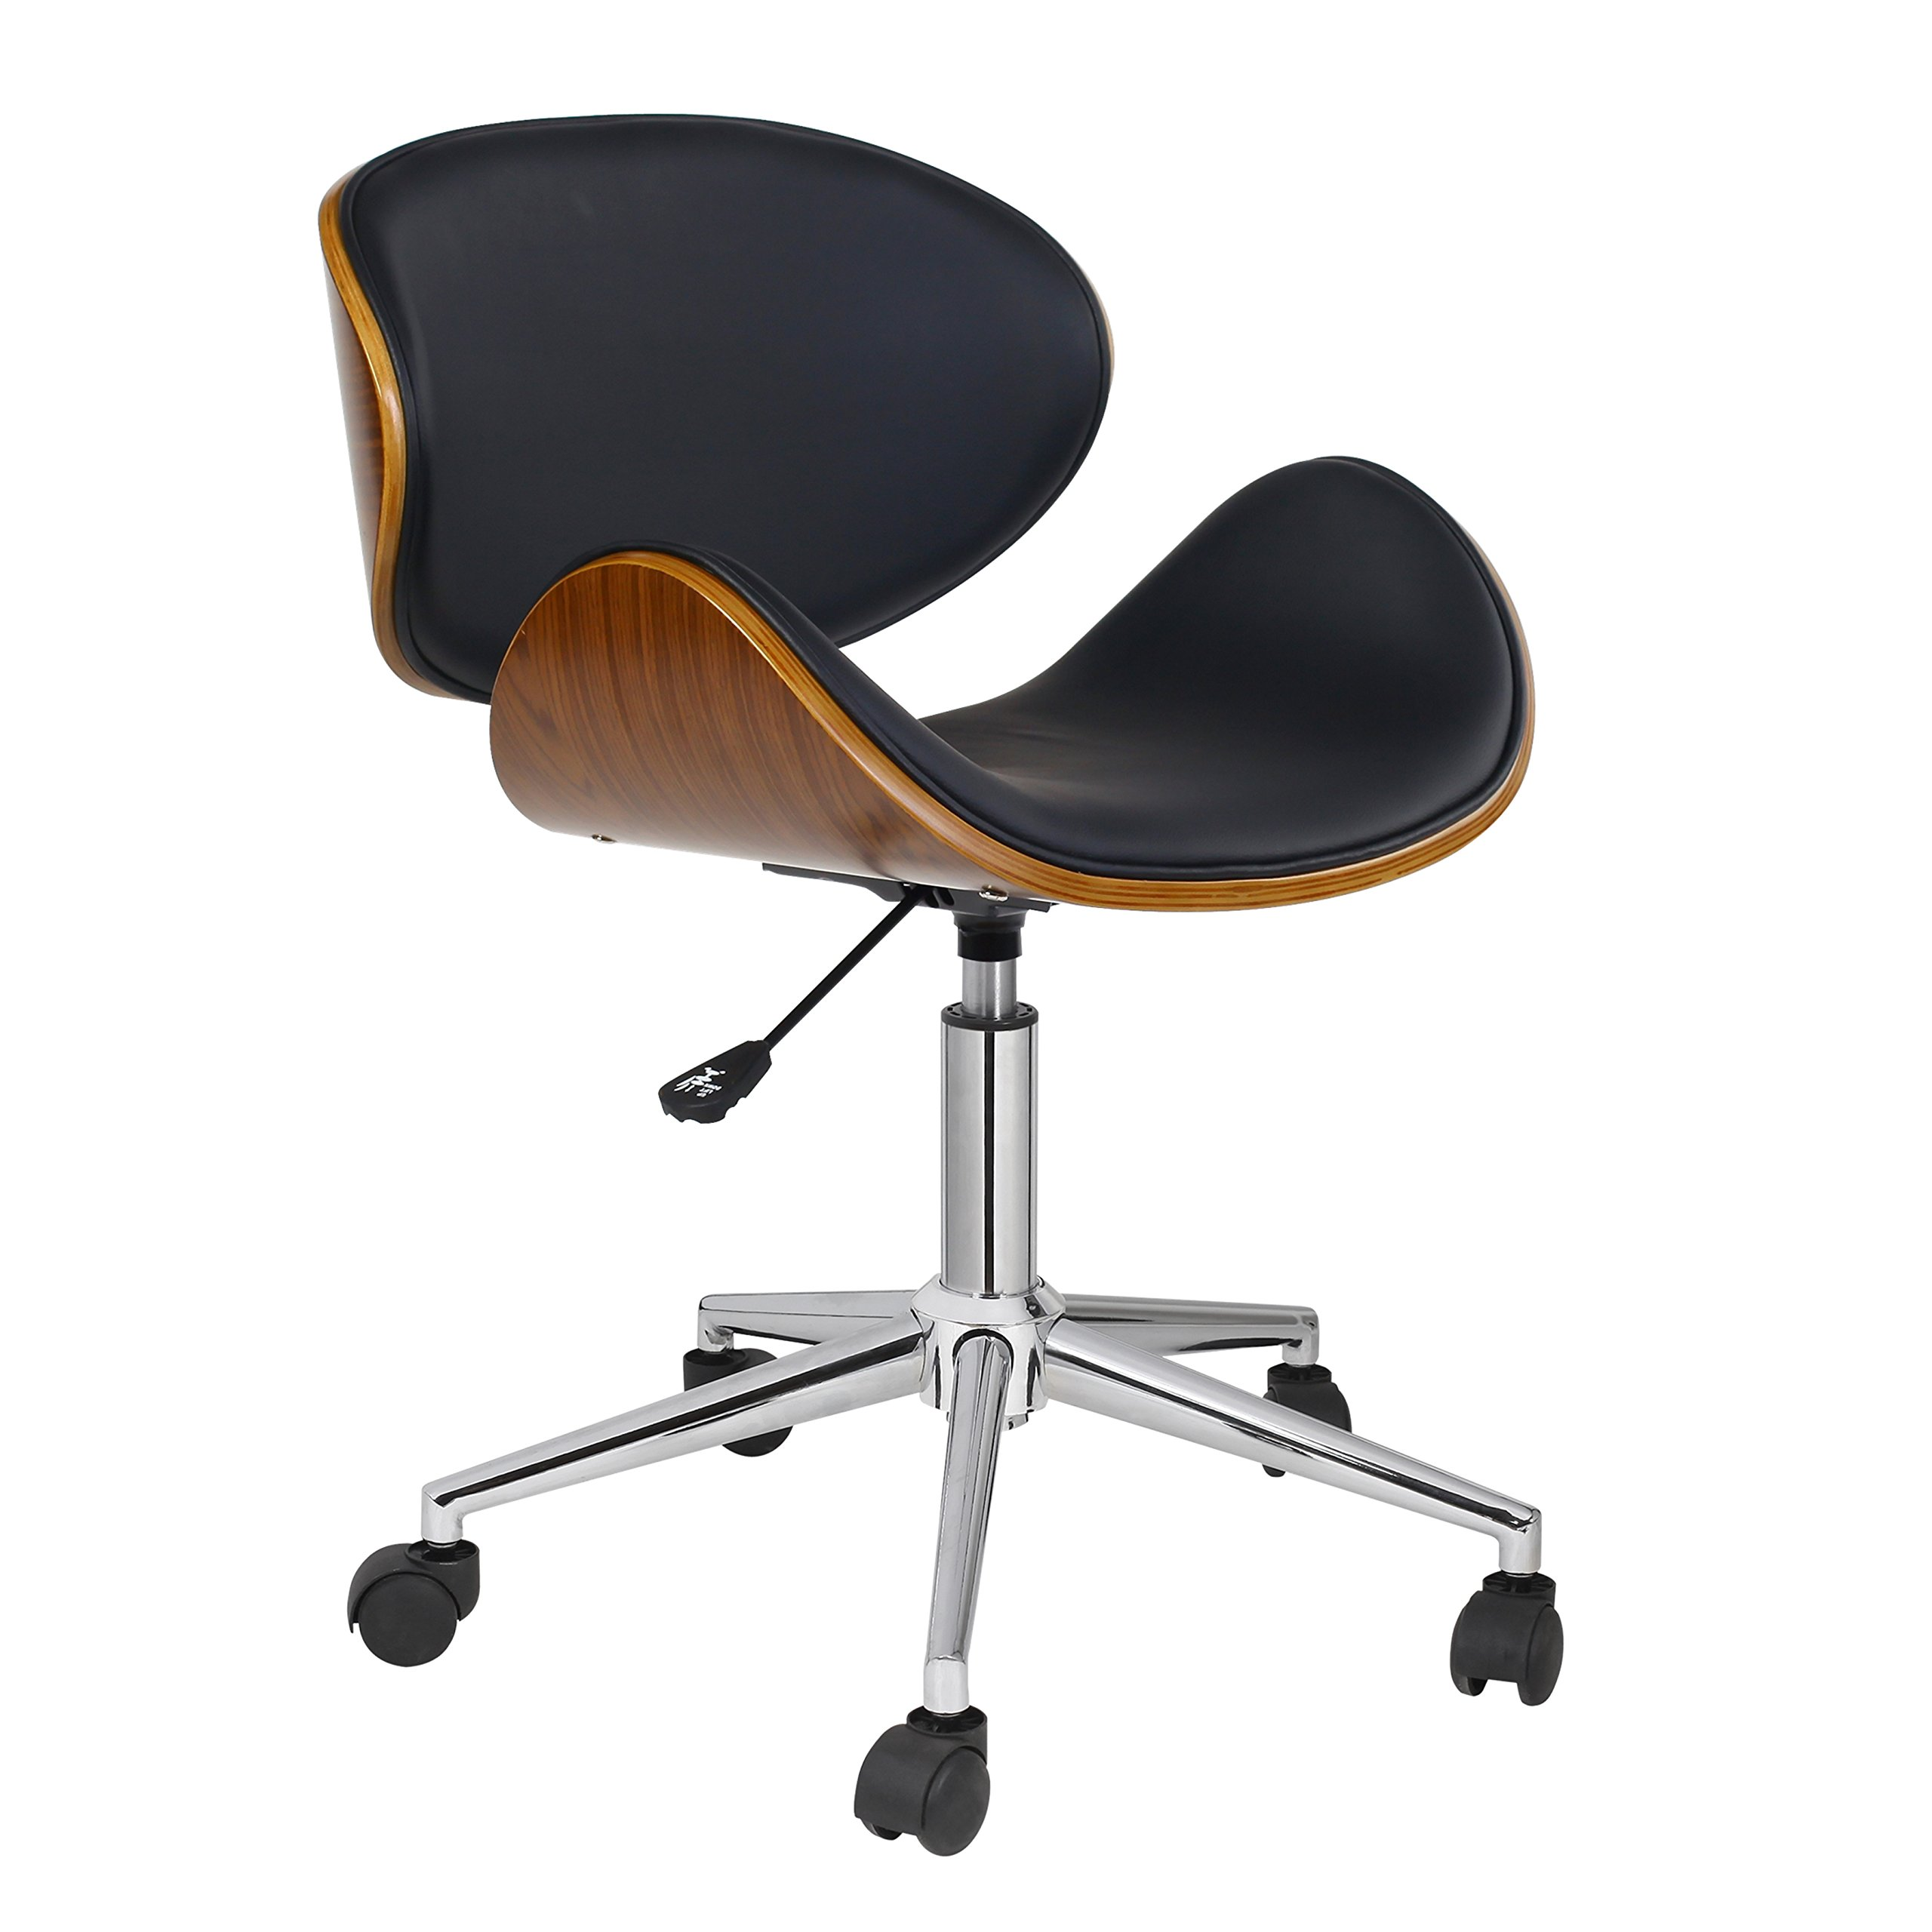 Antique Revival Rylan Office Chair Black